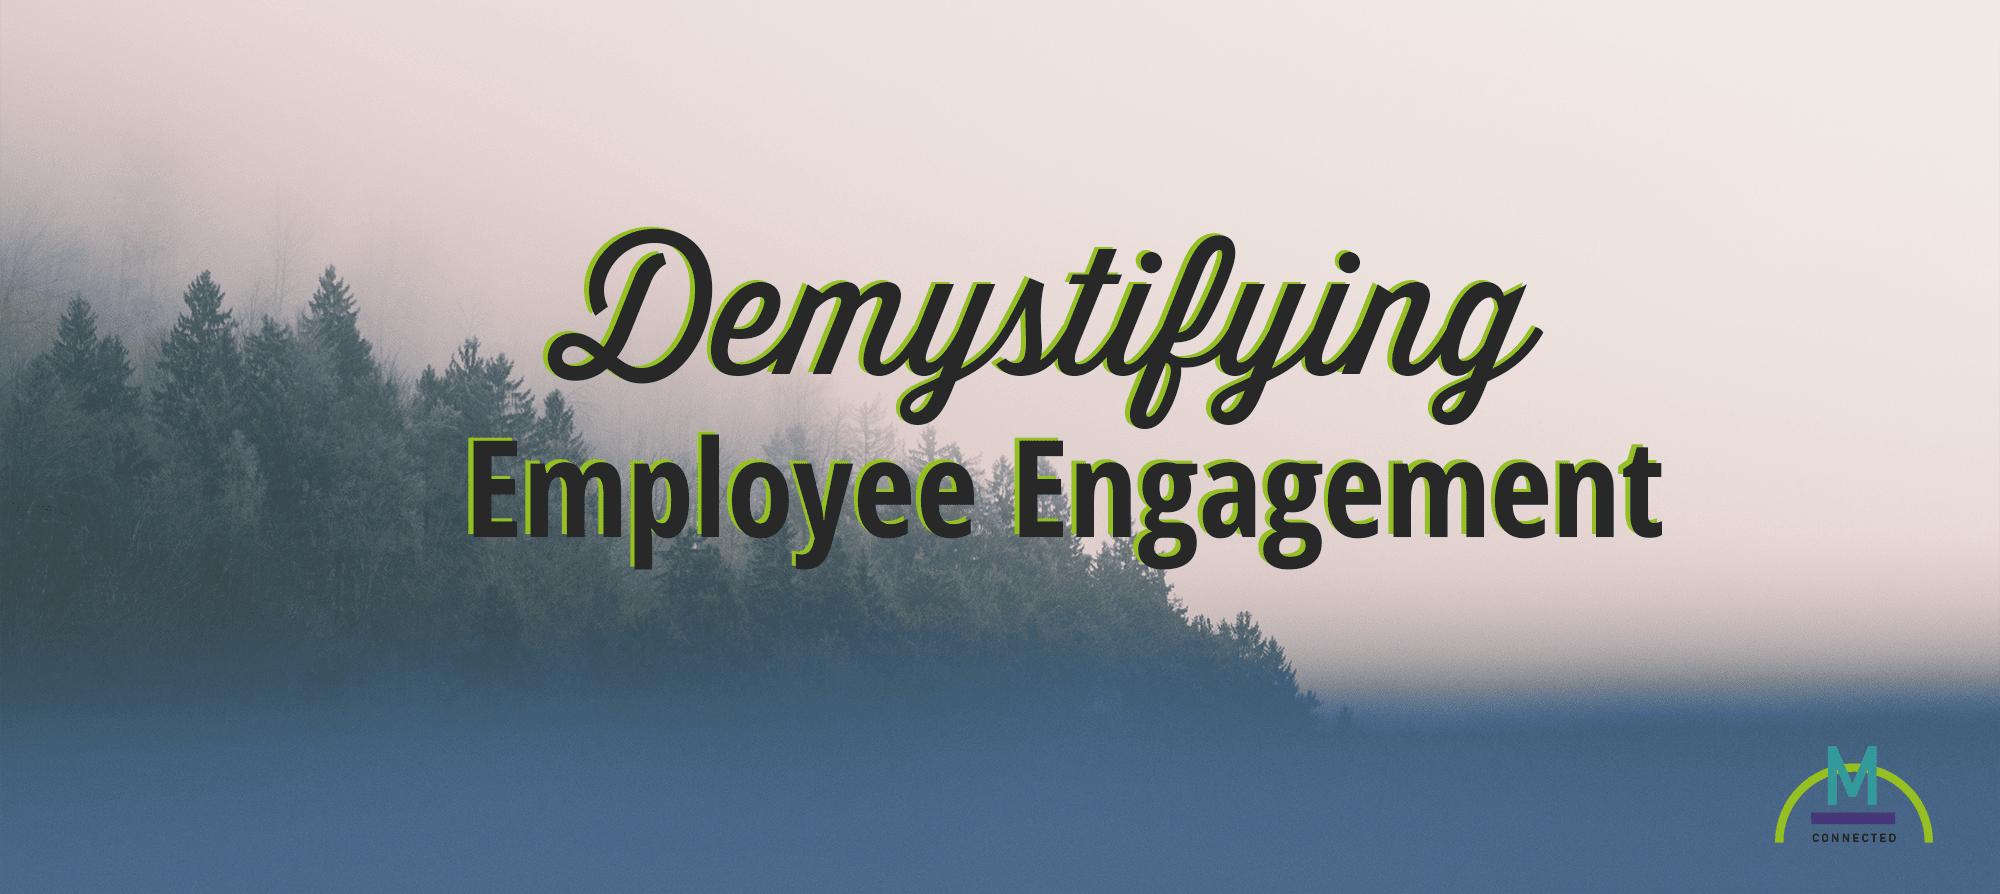 Demystifying Employee Engagement